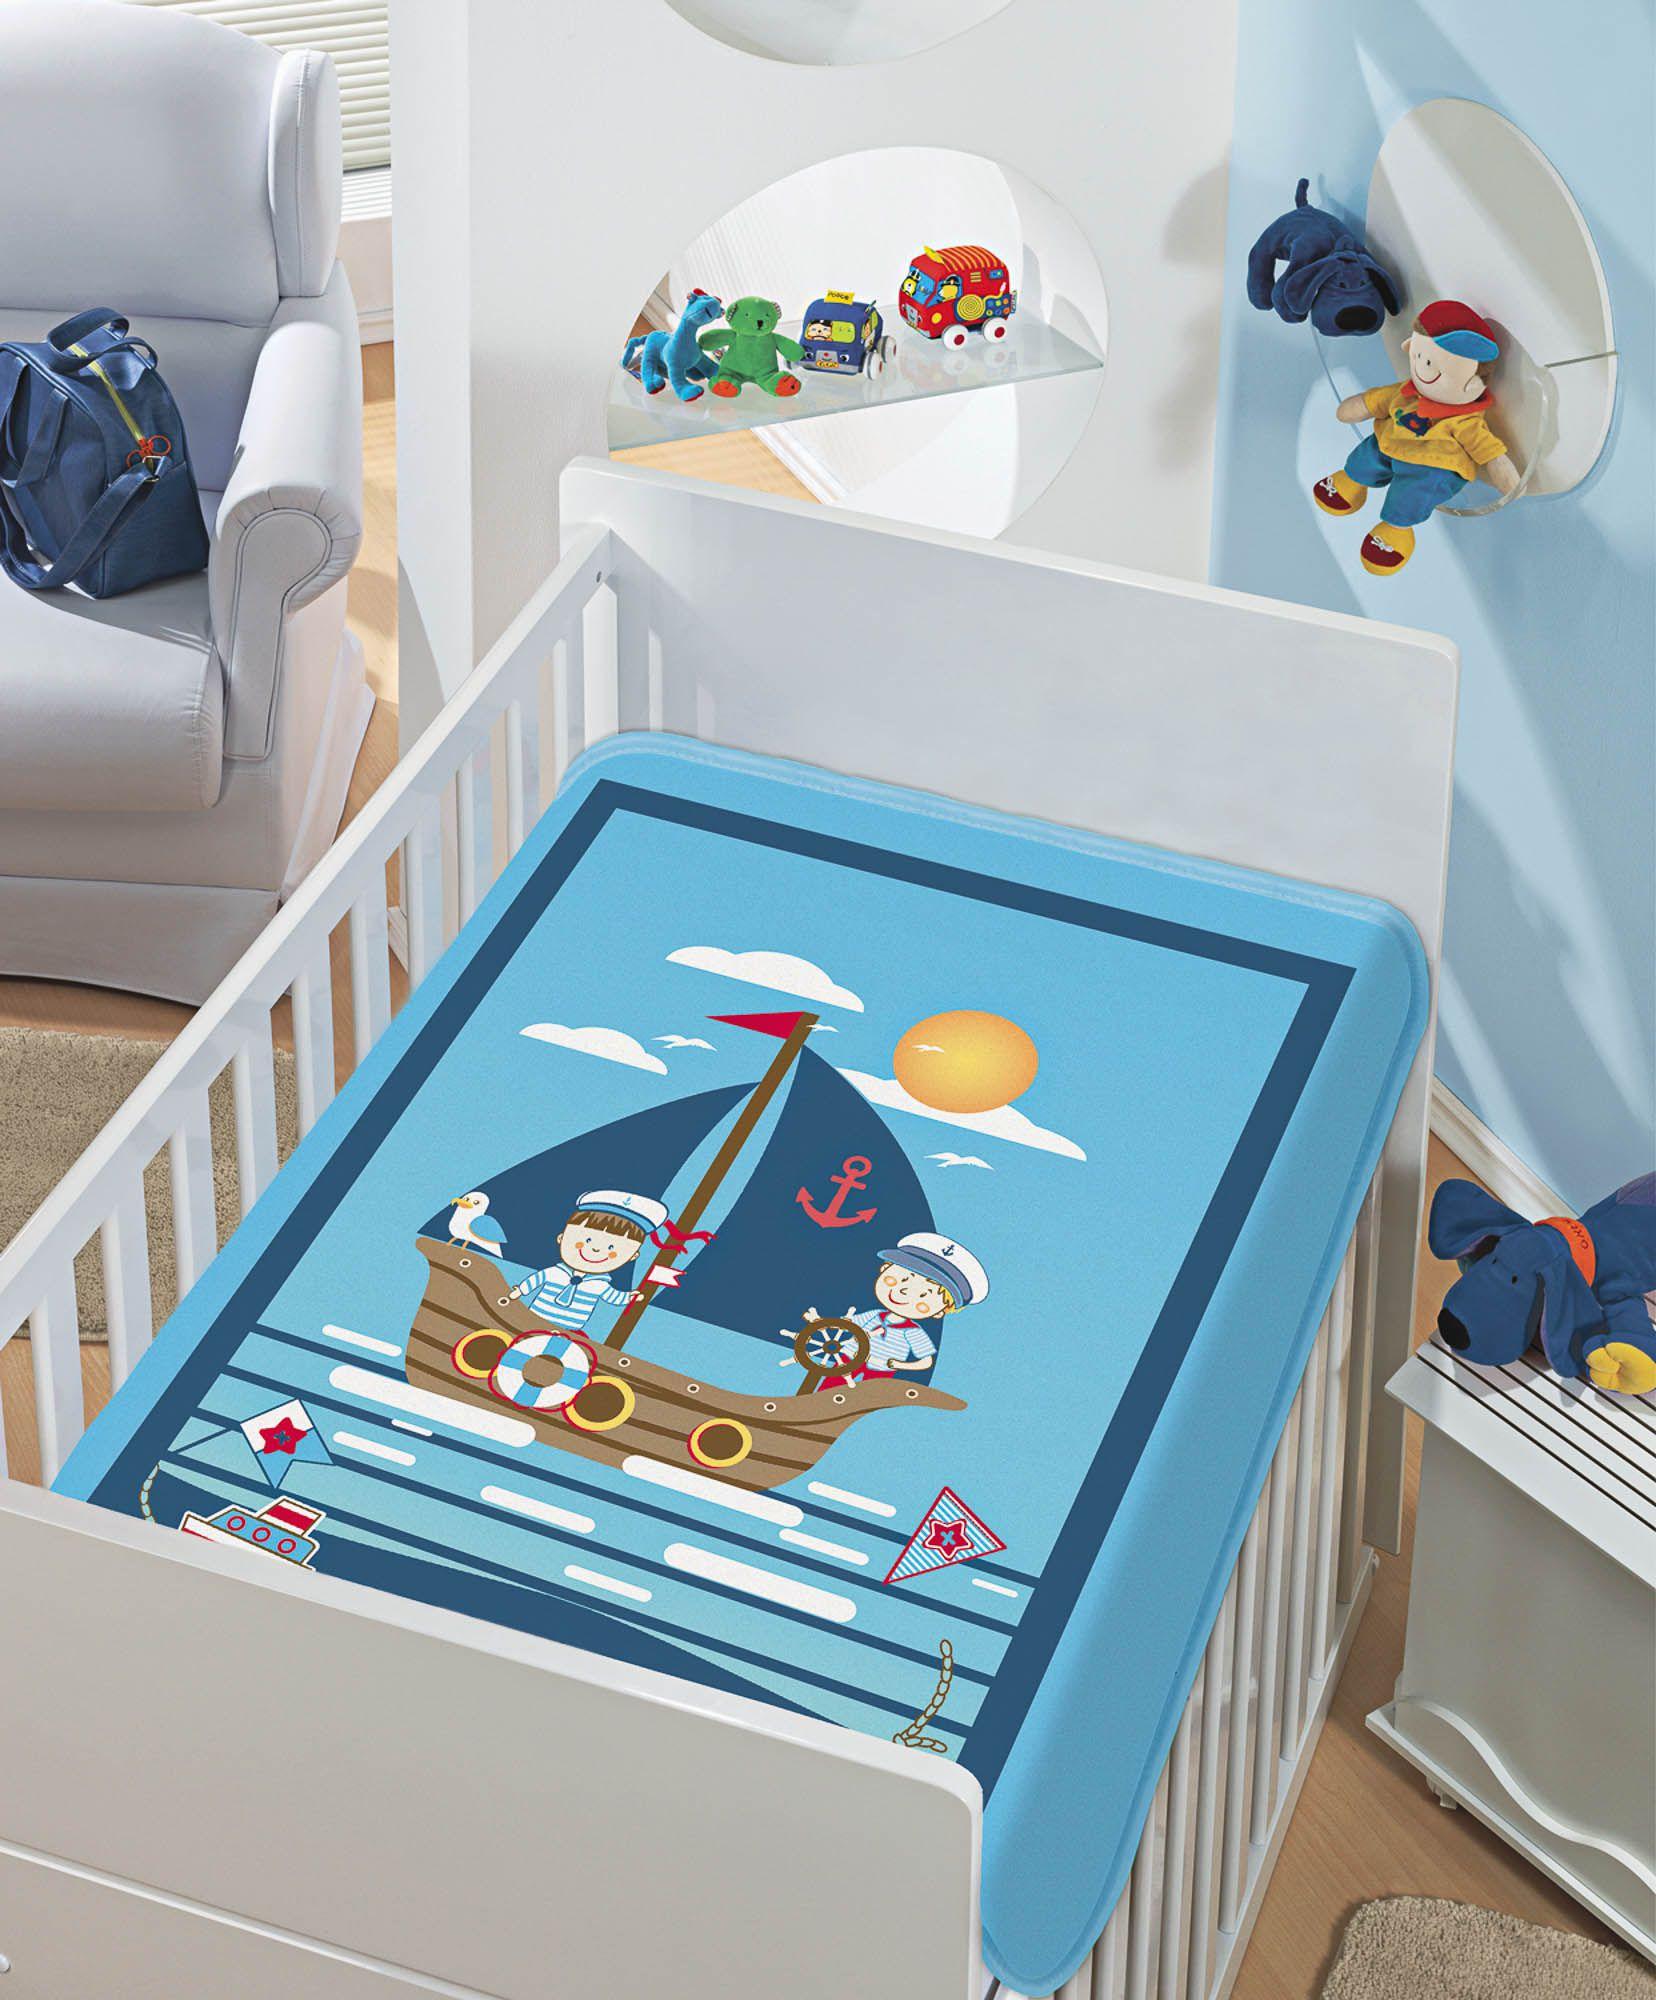 Cobertor Jolitex Raschel Infantil 0,90x1,10m Os Marinheiros Azul